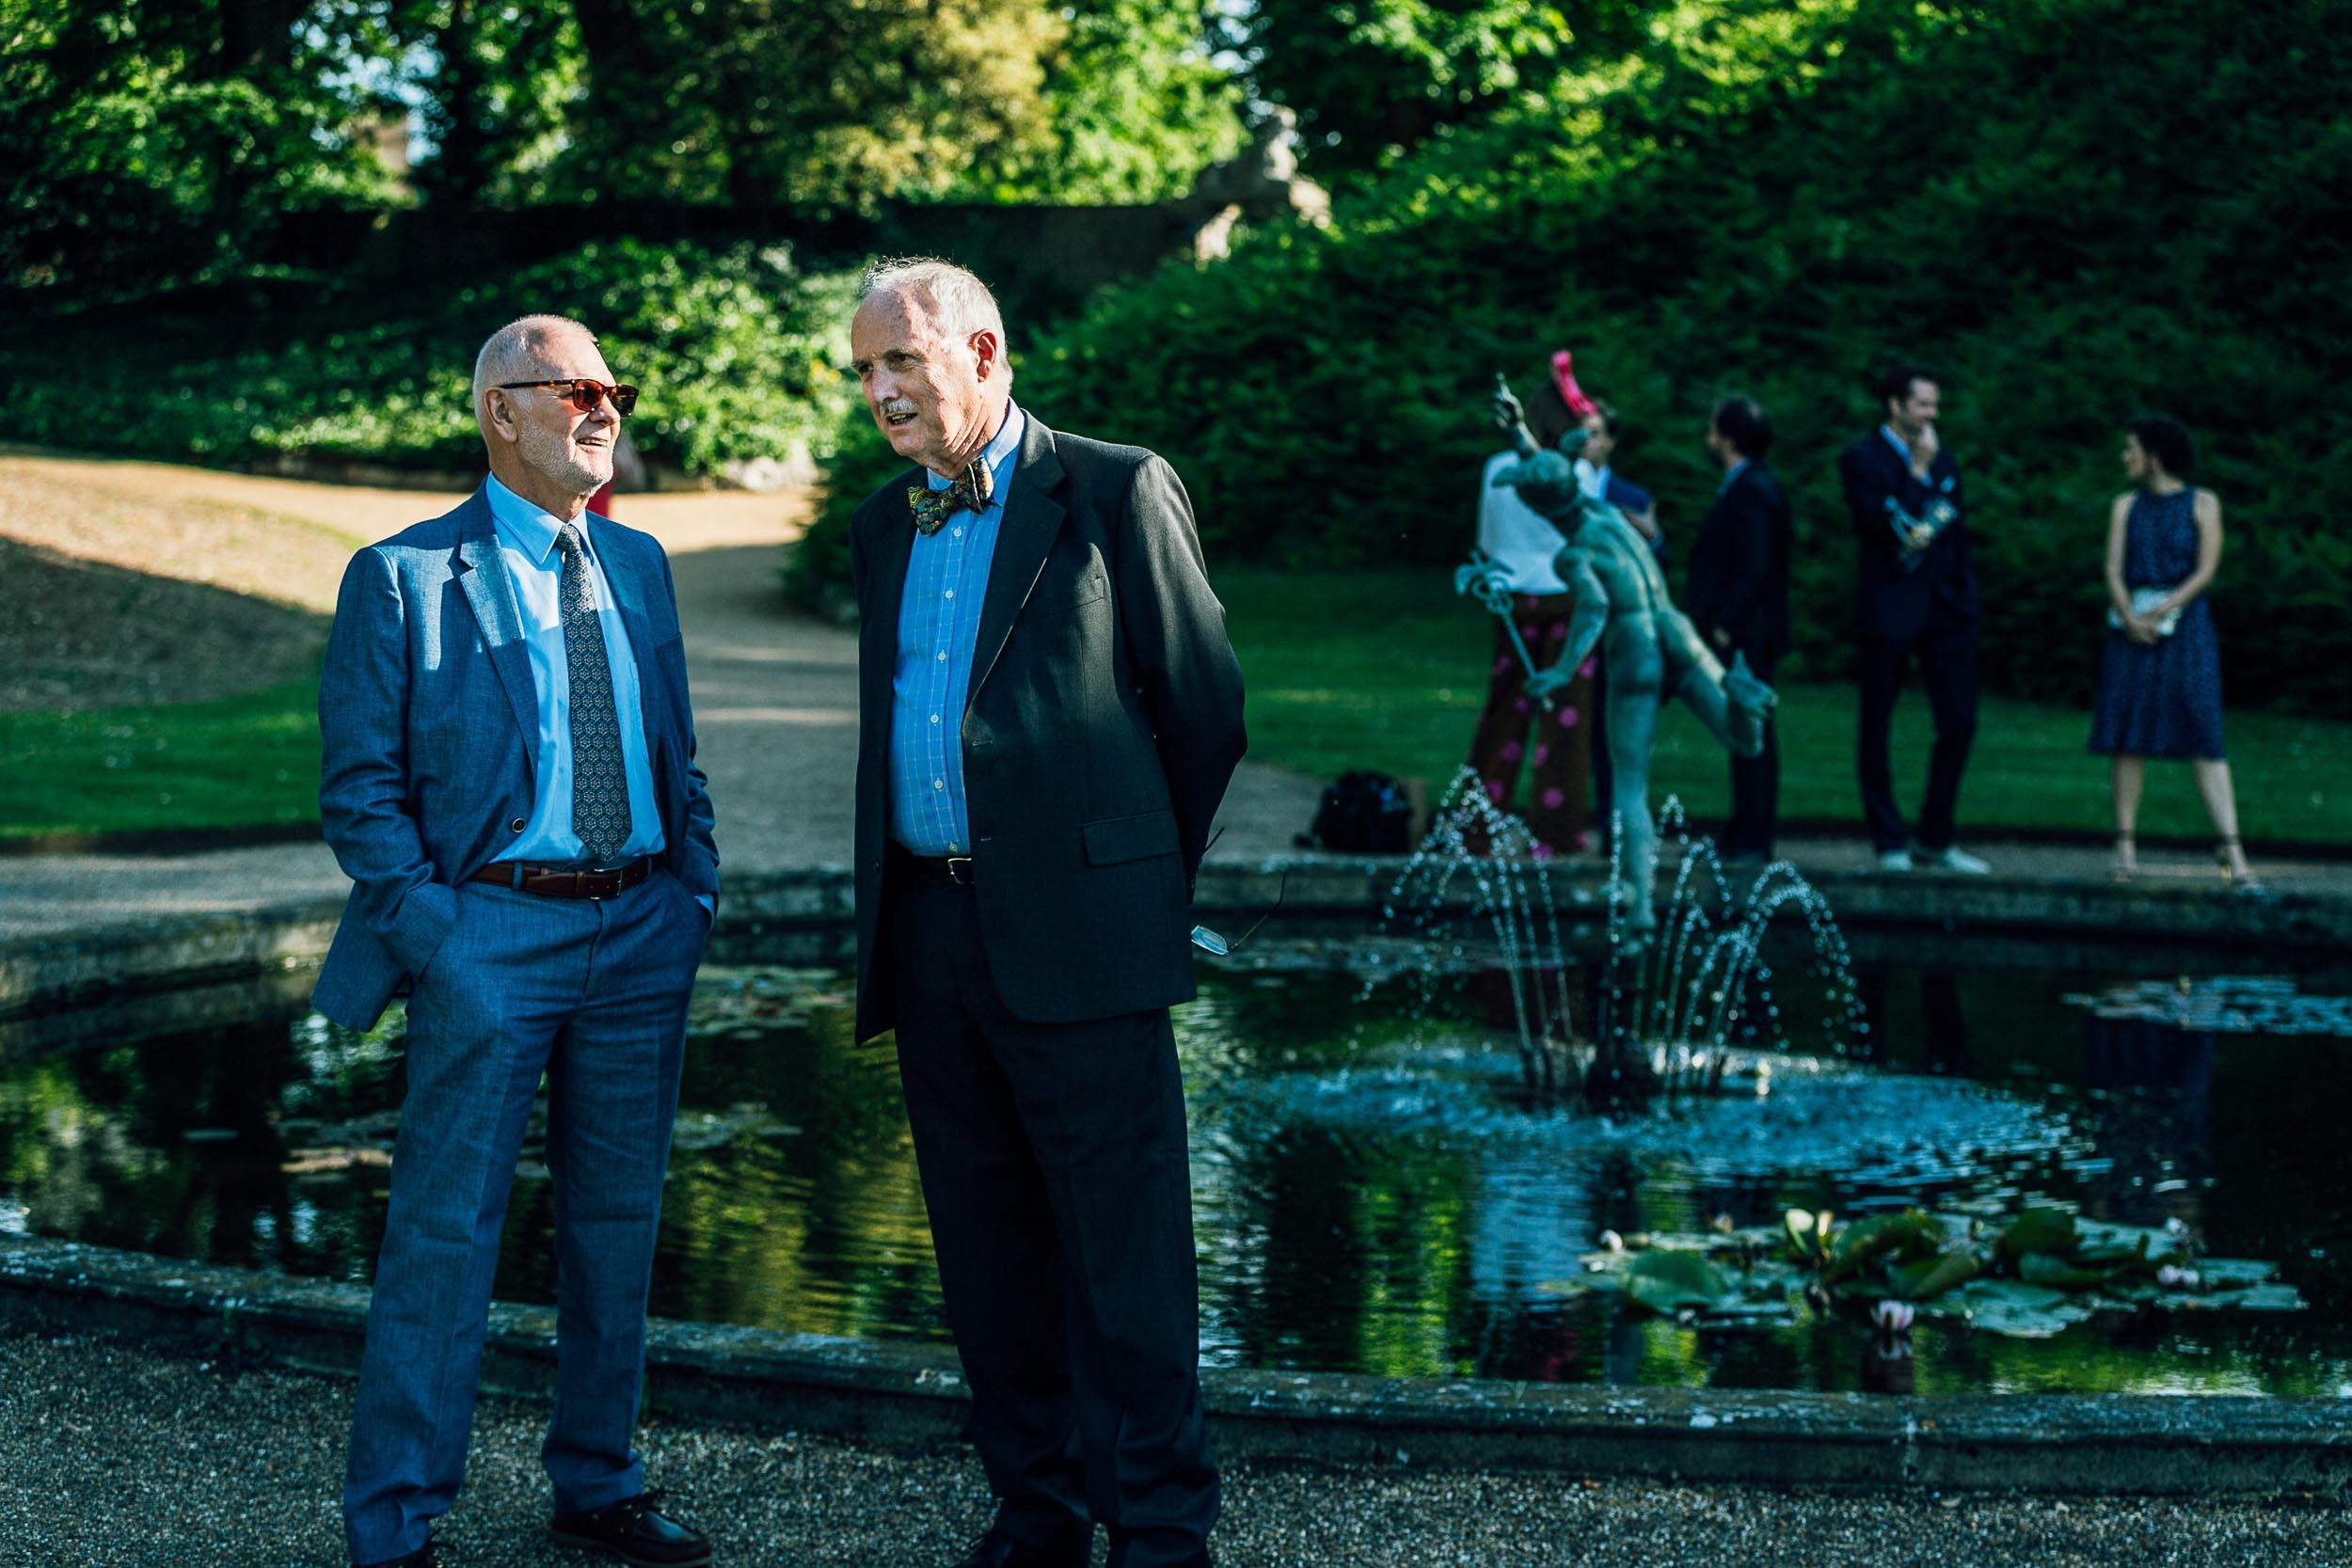 syon-house-wedding-photographer-london 116.jpg